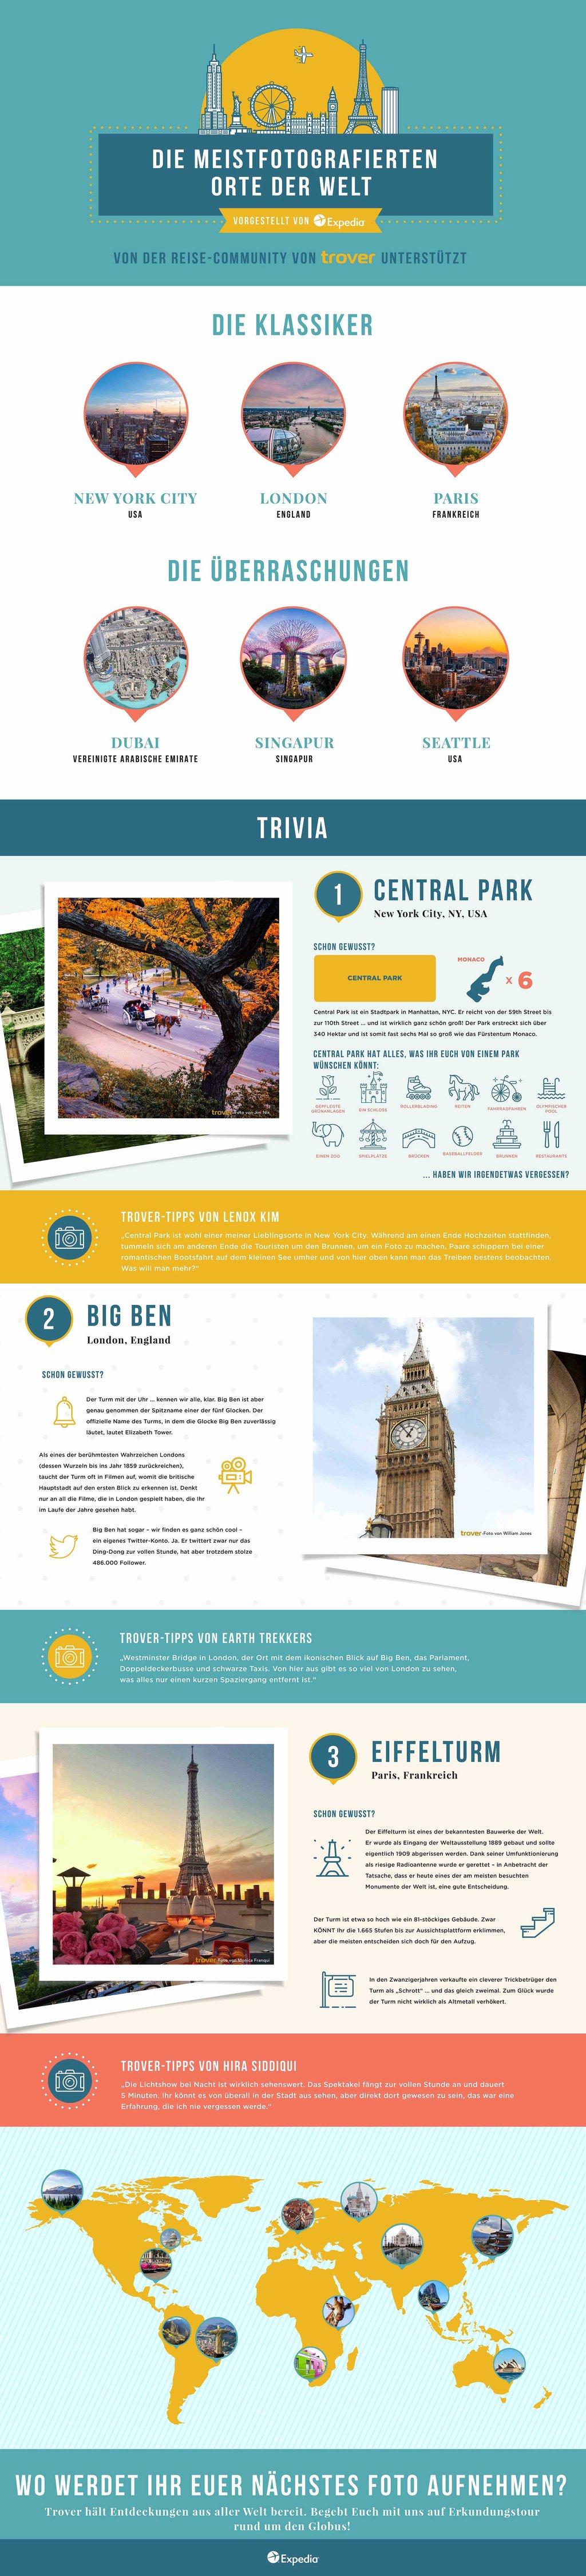 Trover Infografik: meistfotografierte Orte der Welt